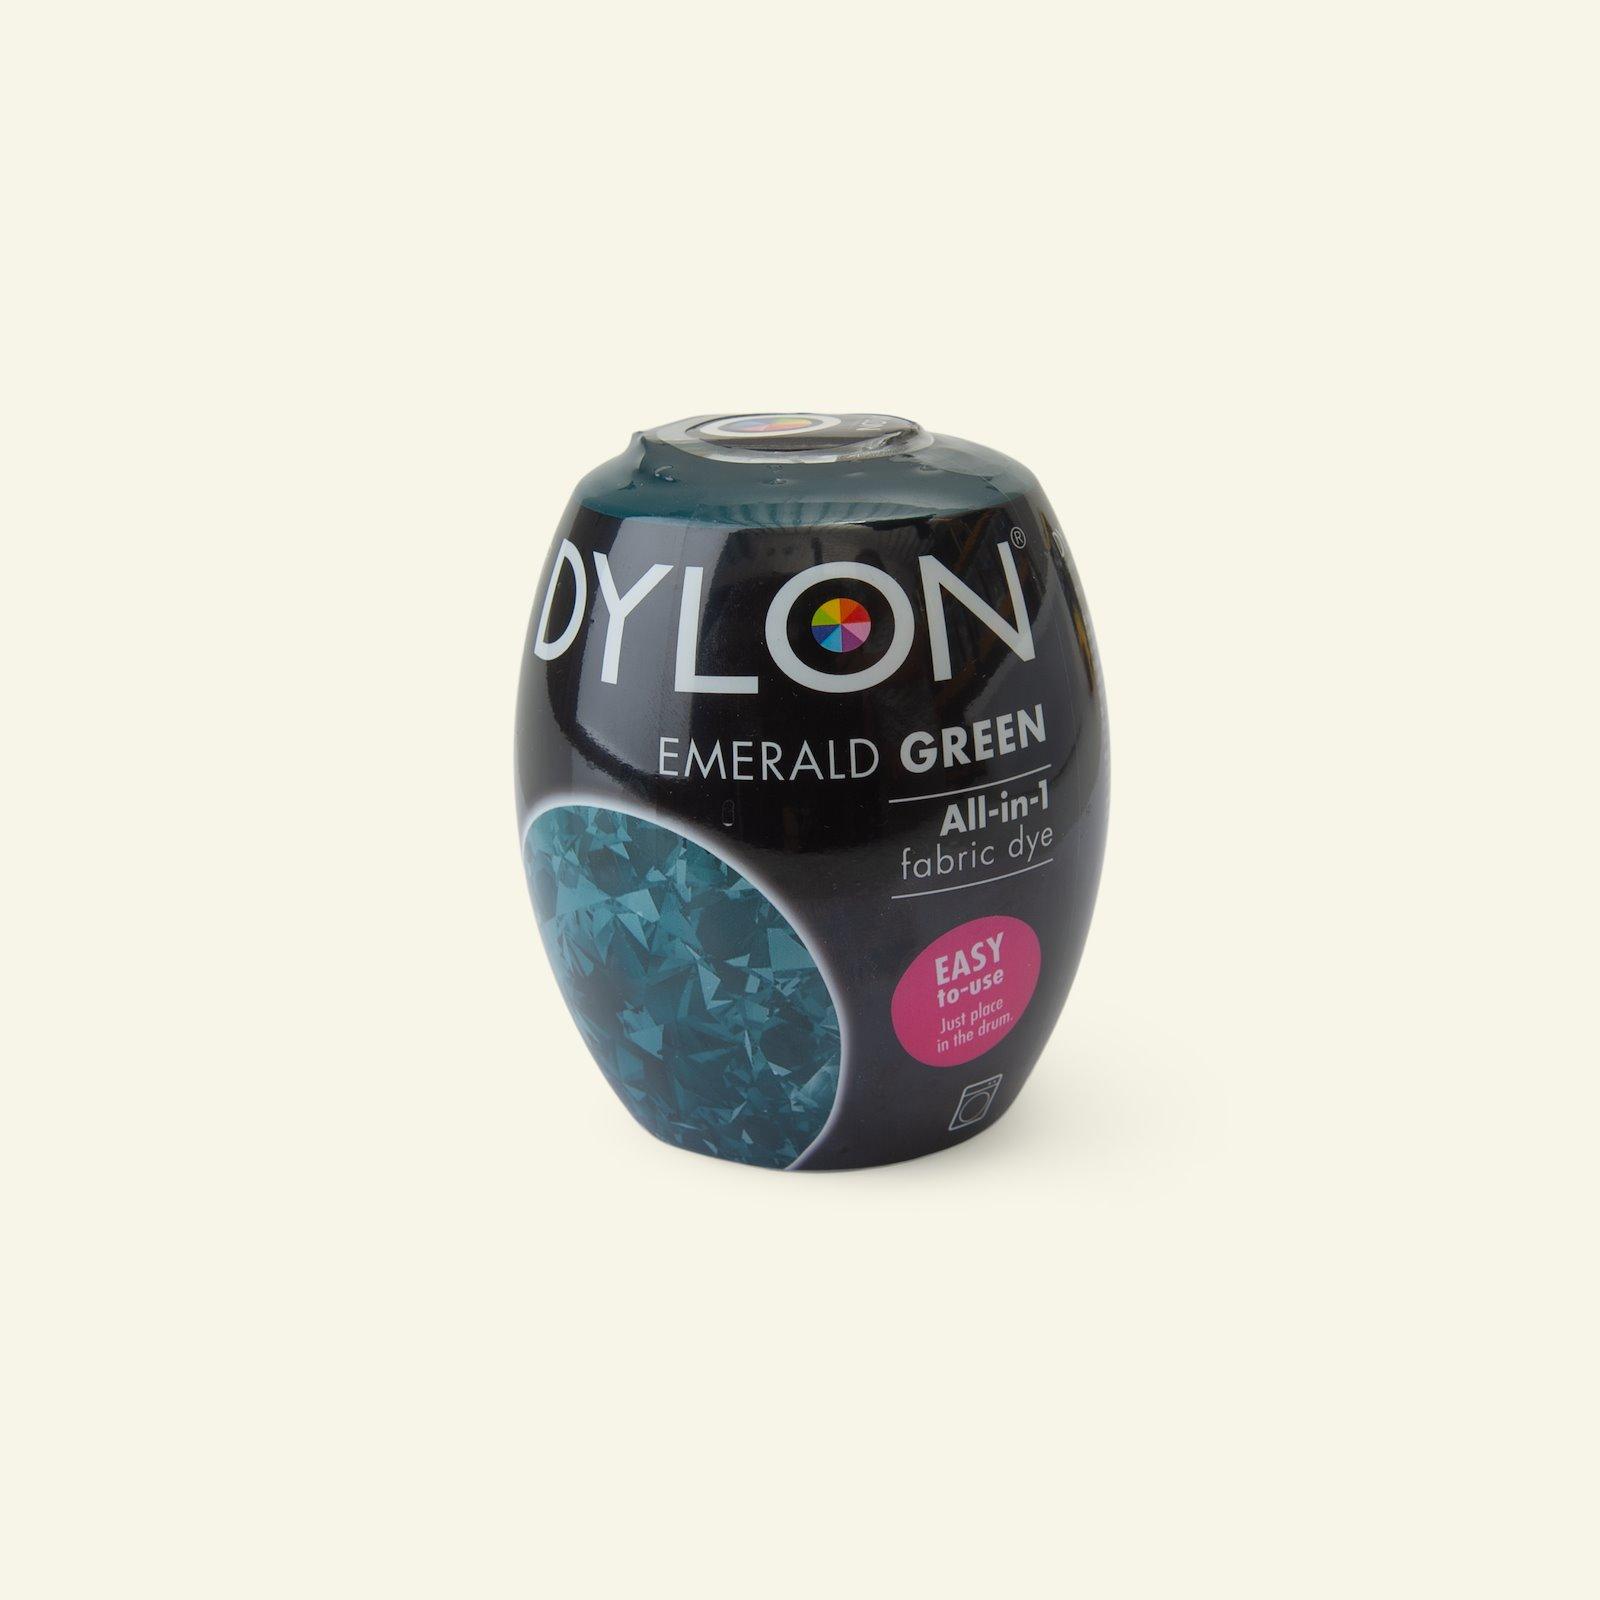 Dylon fabric dye for machine green 29700_pack_b